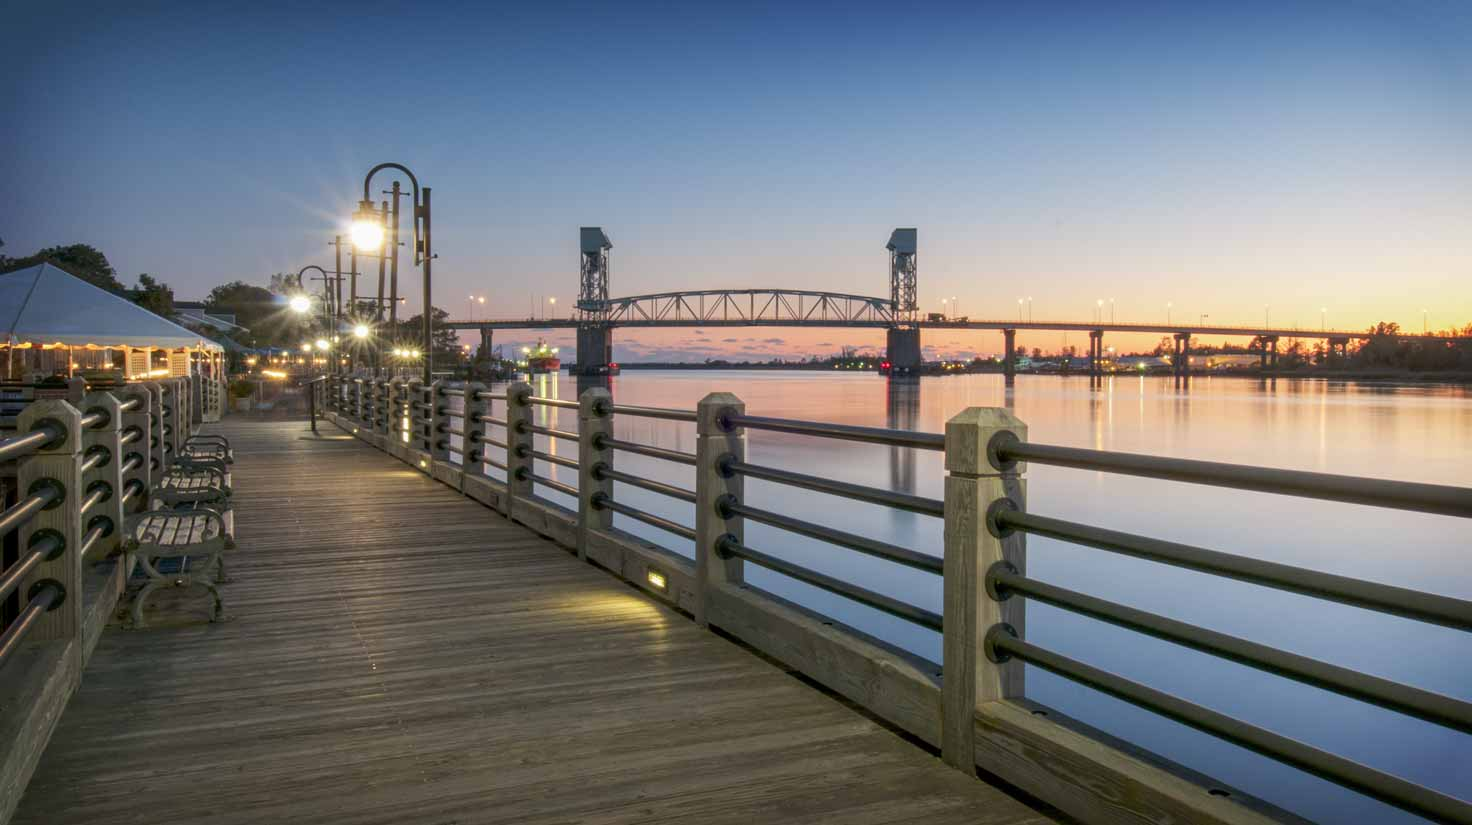 Pictures of Wilmington